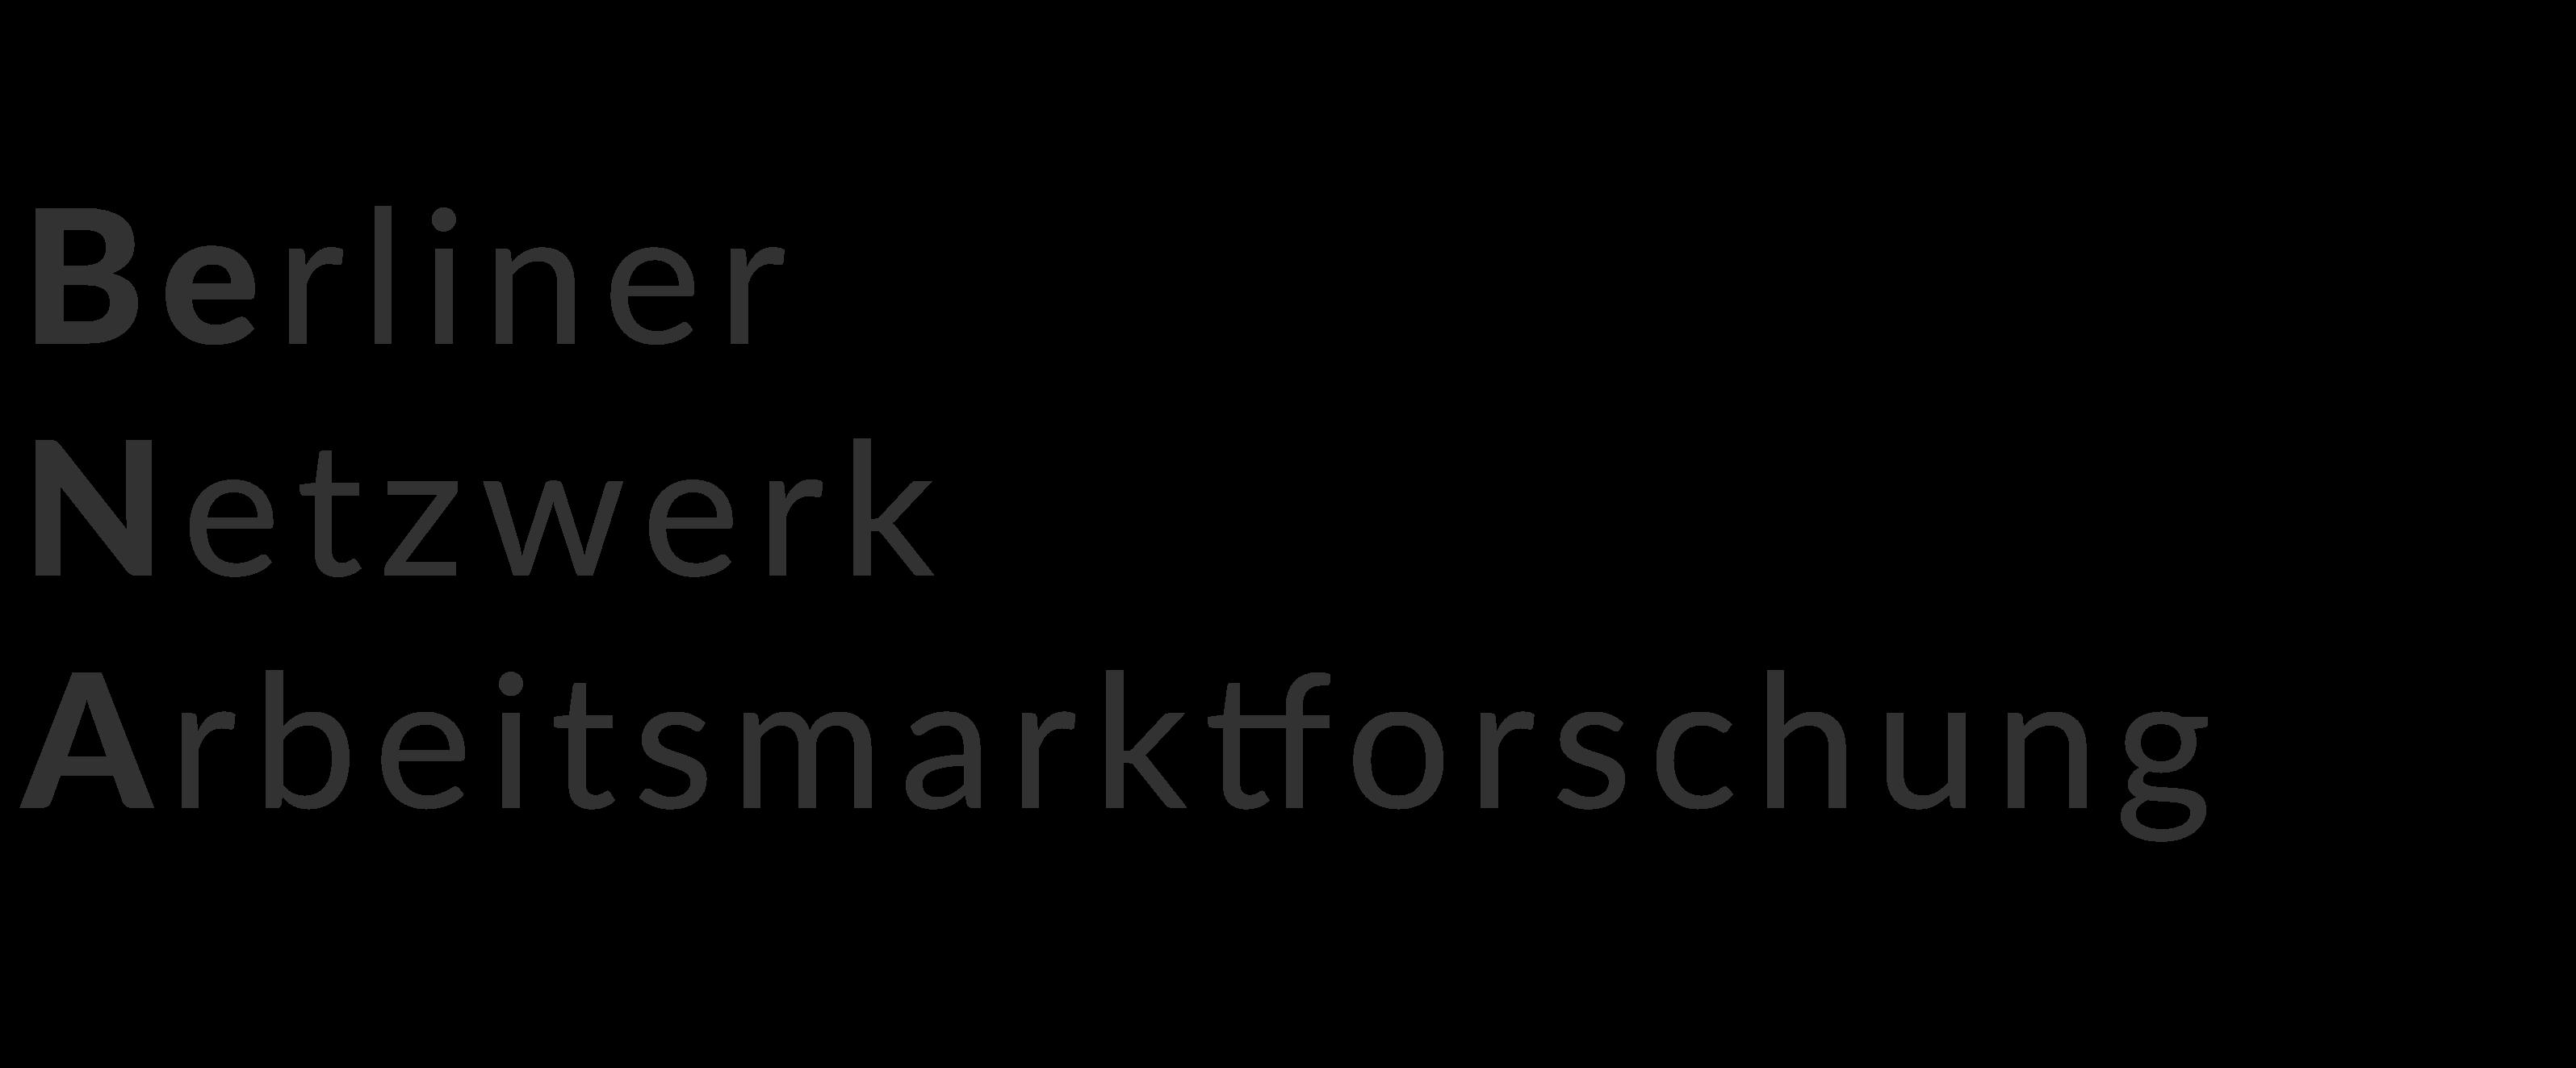 BeNA Berliner Netzwerk Arbeitsmarktforschung